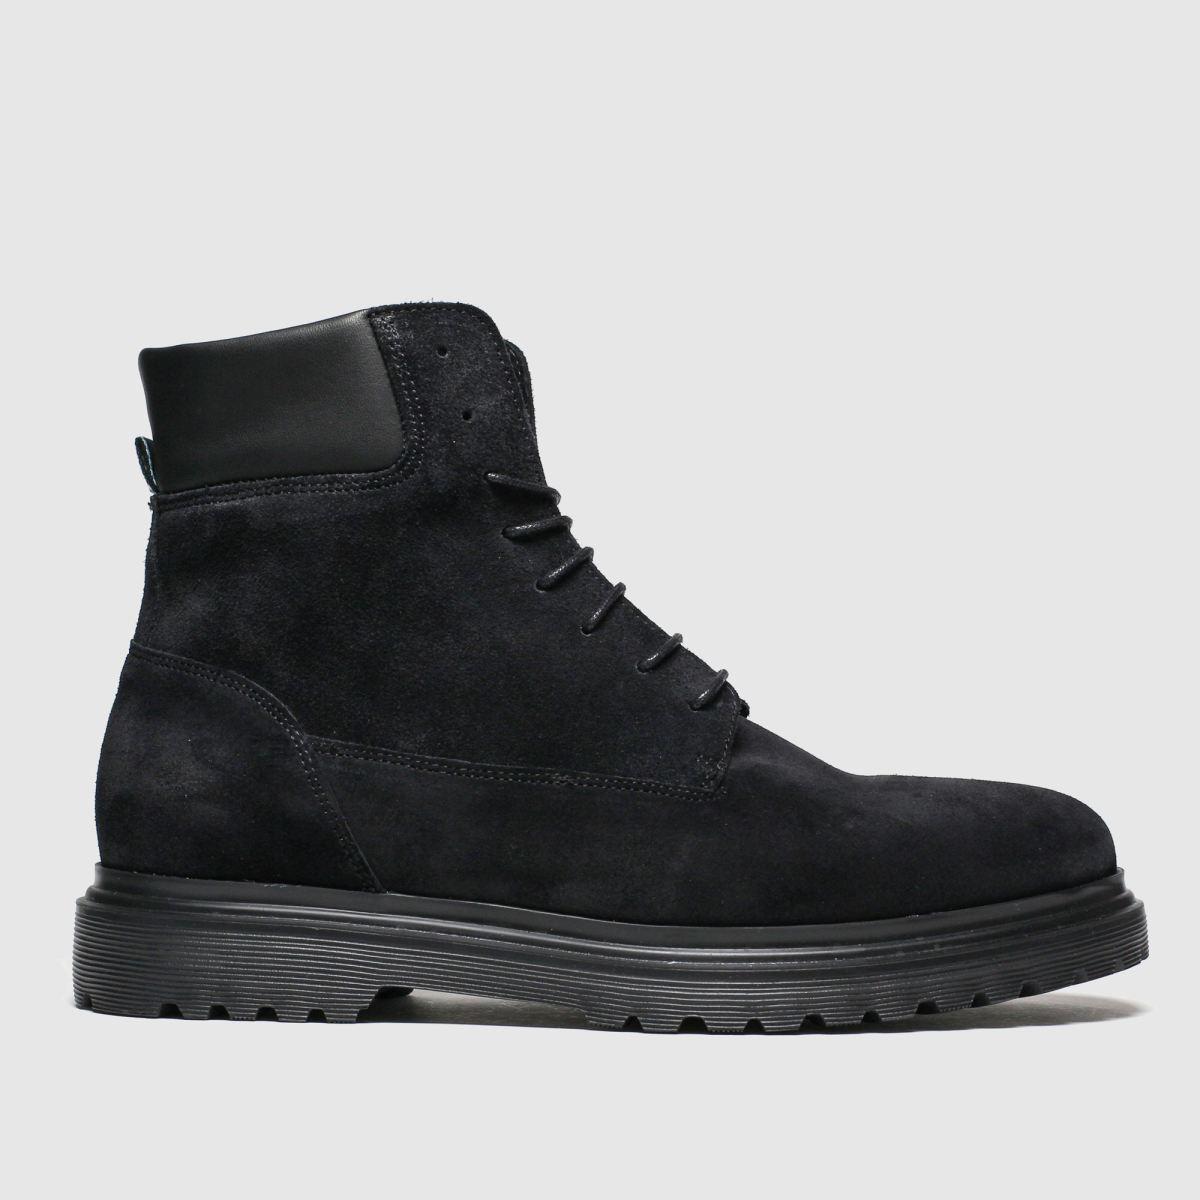 Shoe the Bear Shoe The Bear Black Heard Boots